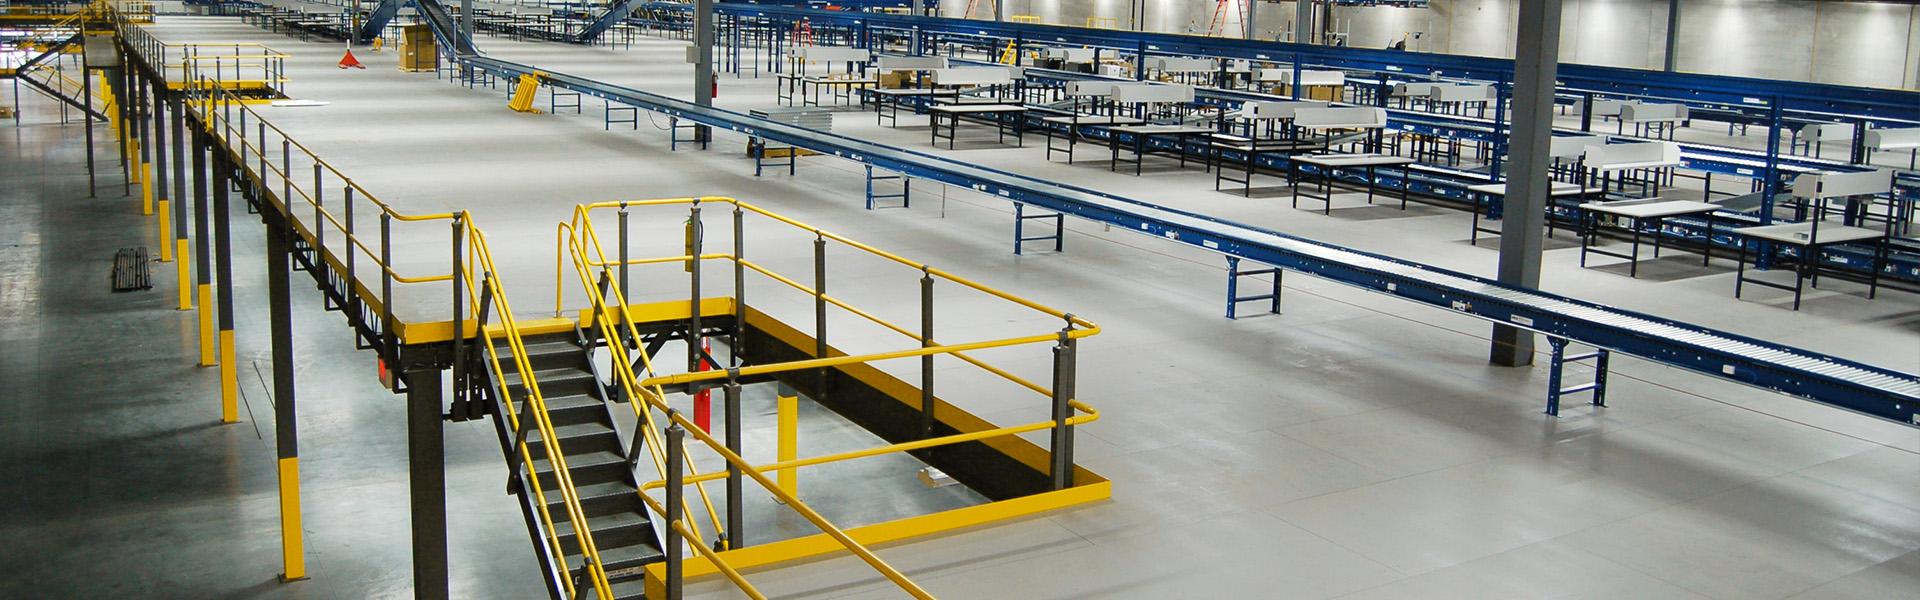 Large distribution center mezzanine with conveyor